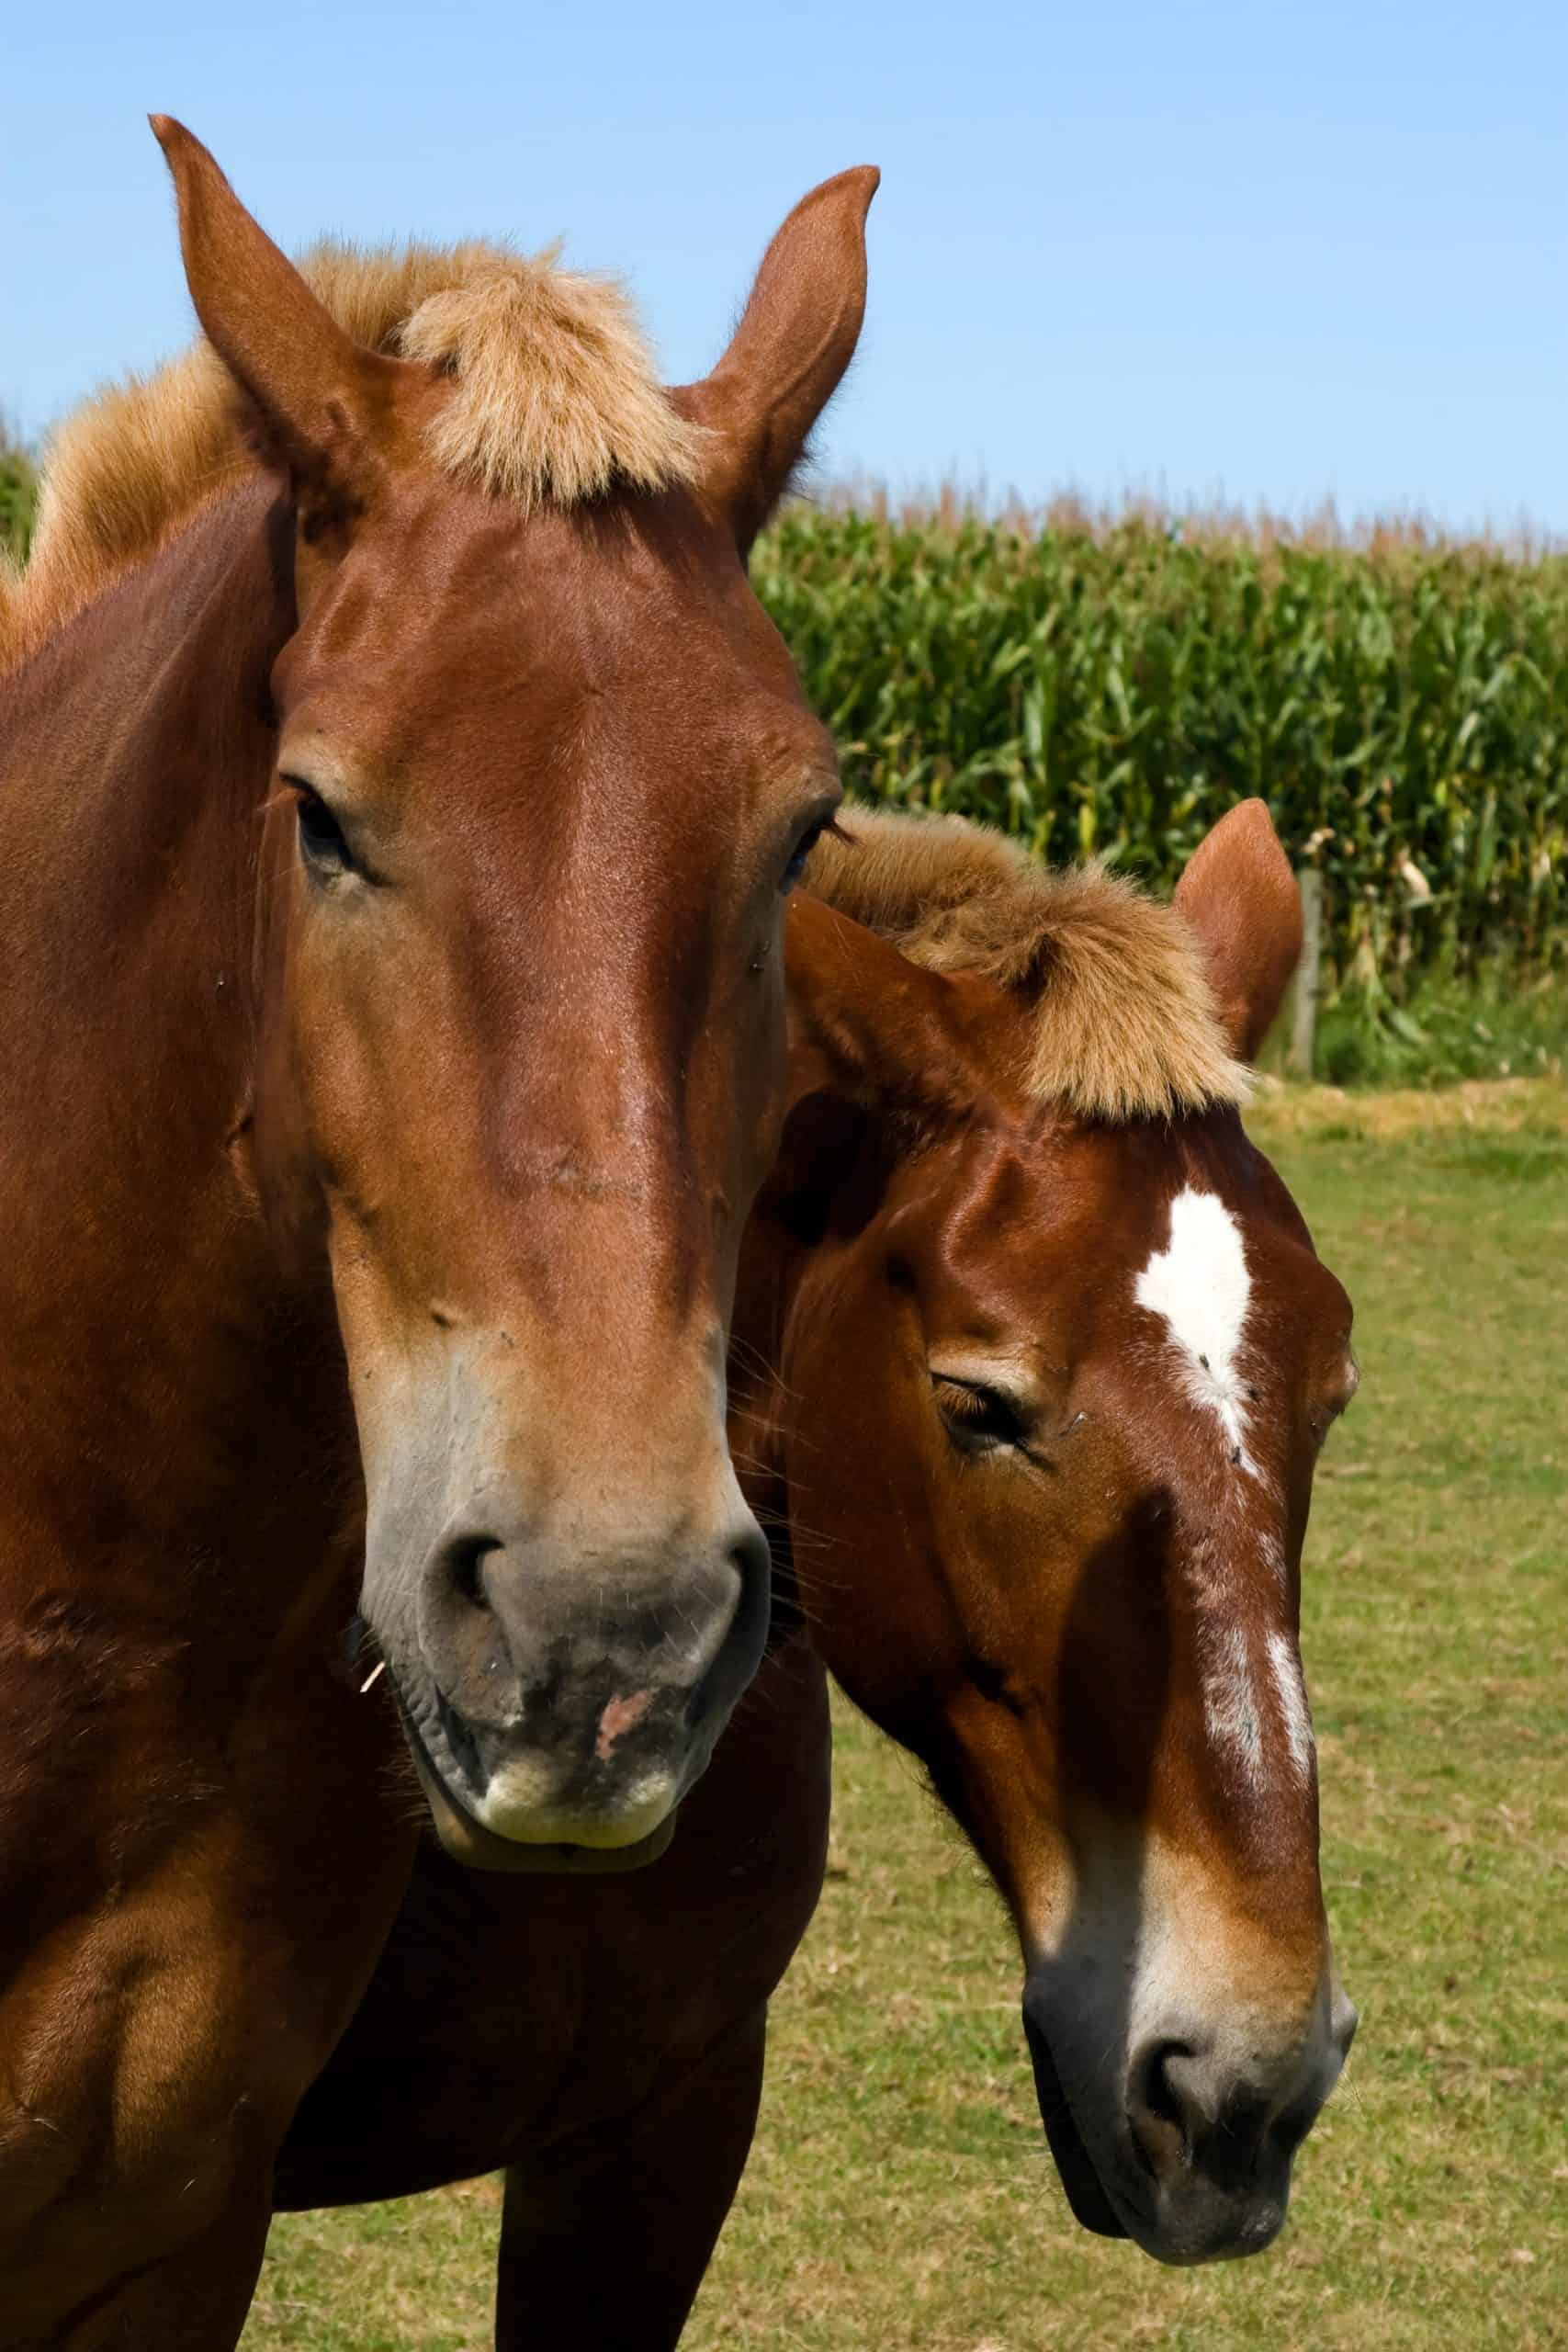 Two morgan horses on an Amish farm.